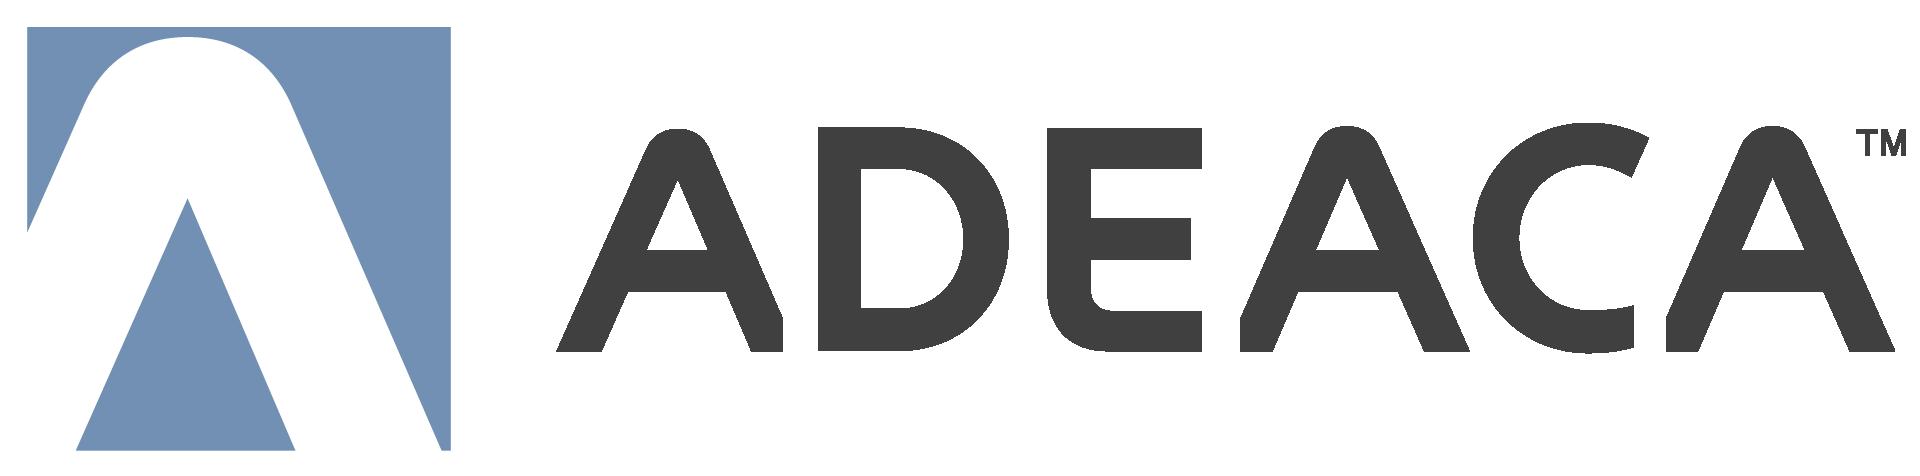 Matt Mong of Adeaca Talks Successful Growth Strategy Plan in Forbes